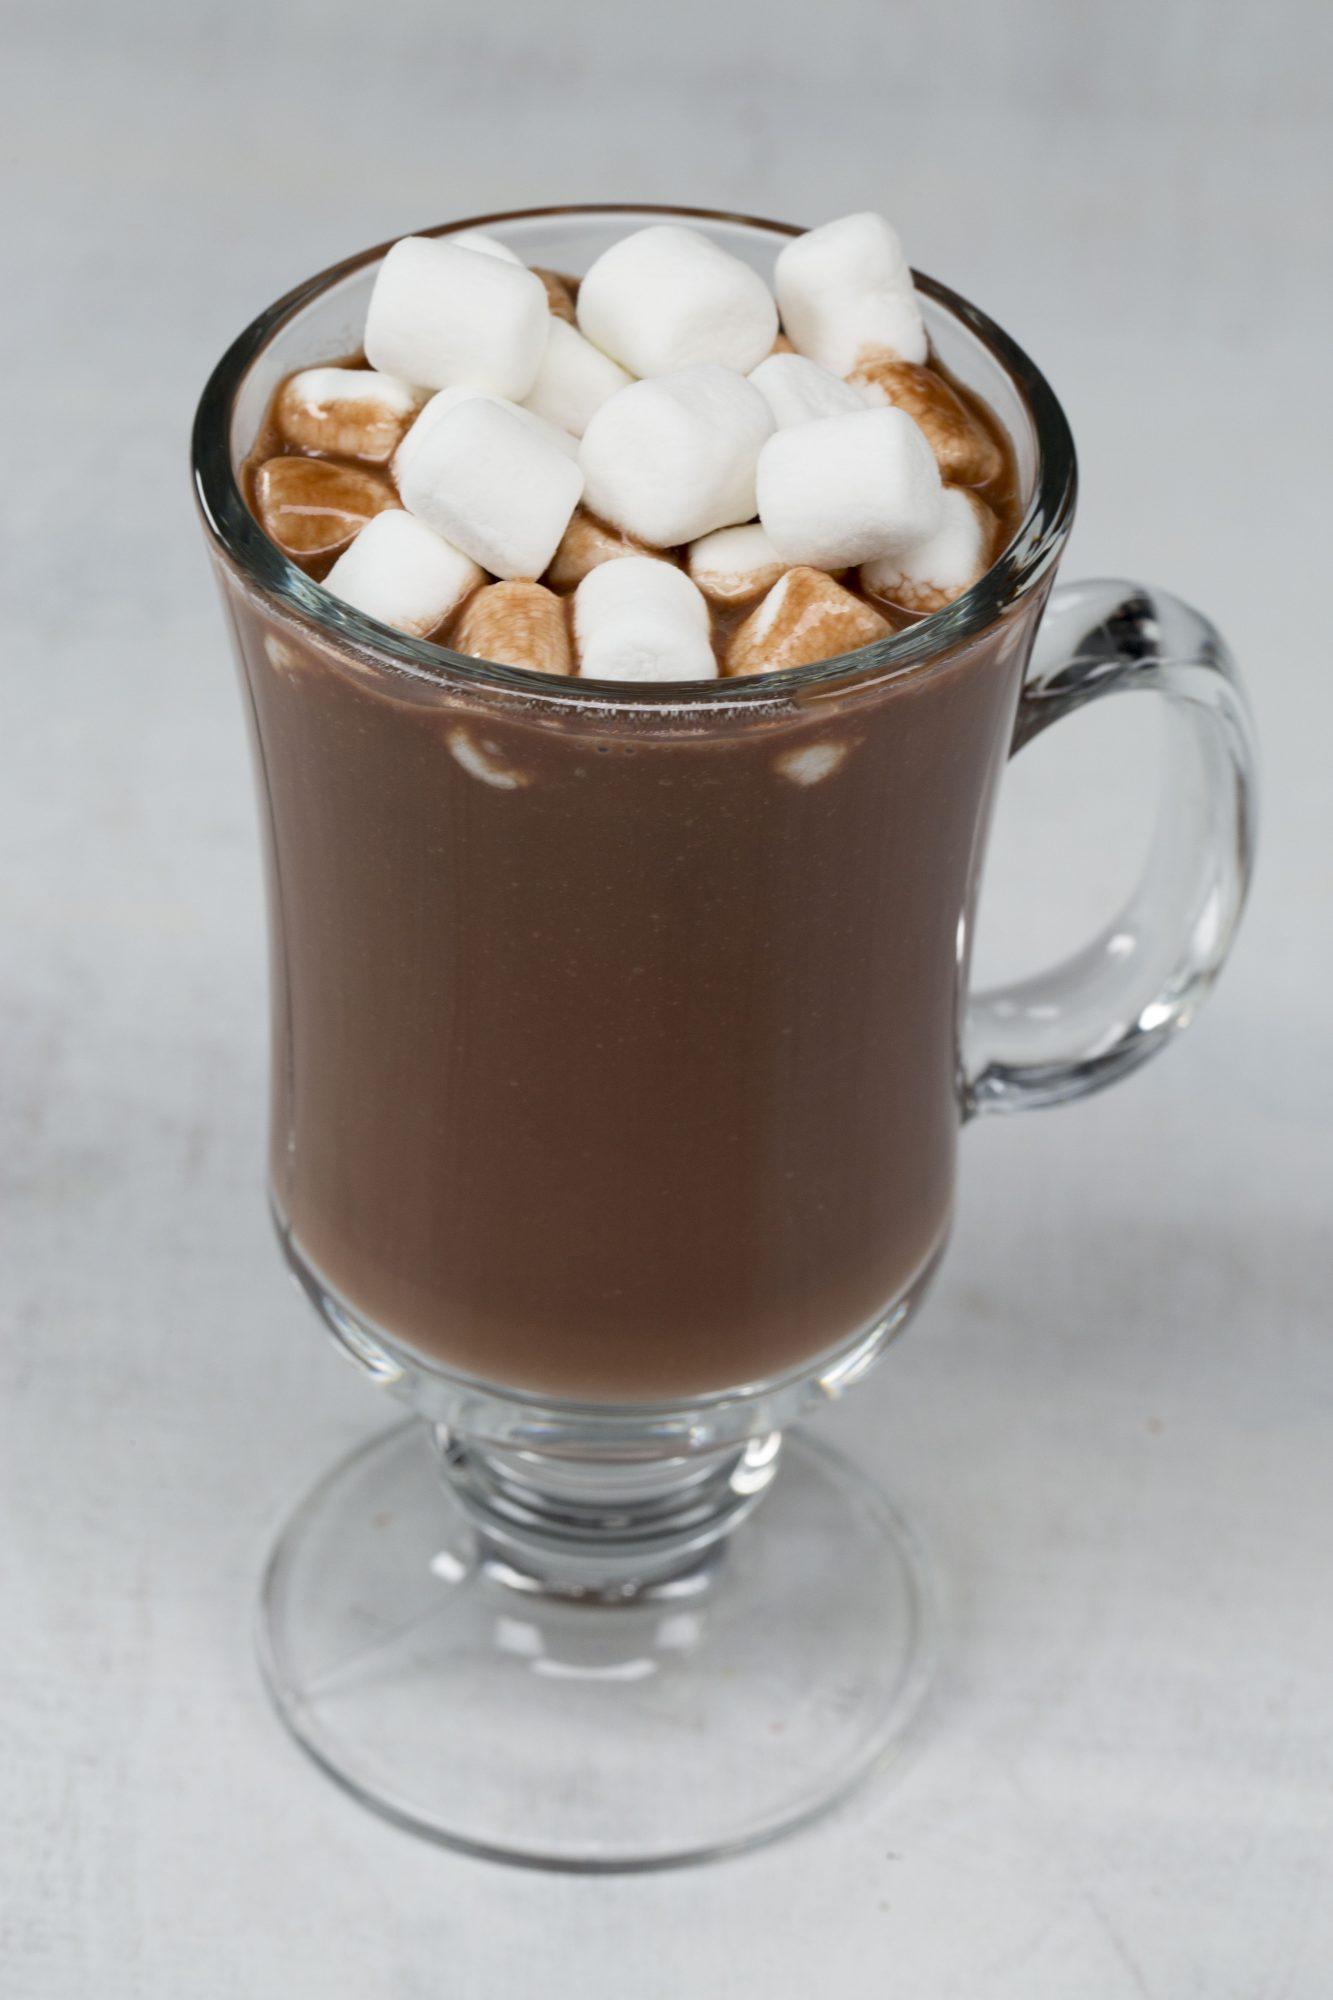 Creamy Dairy-Free Hot Chocolate image